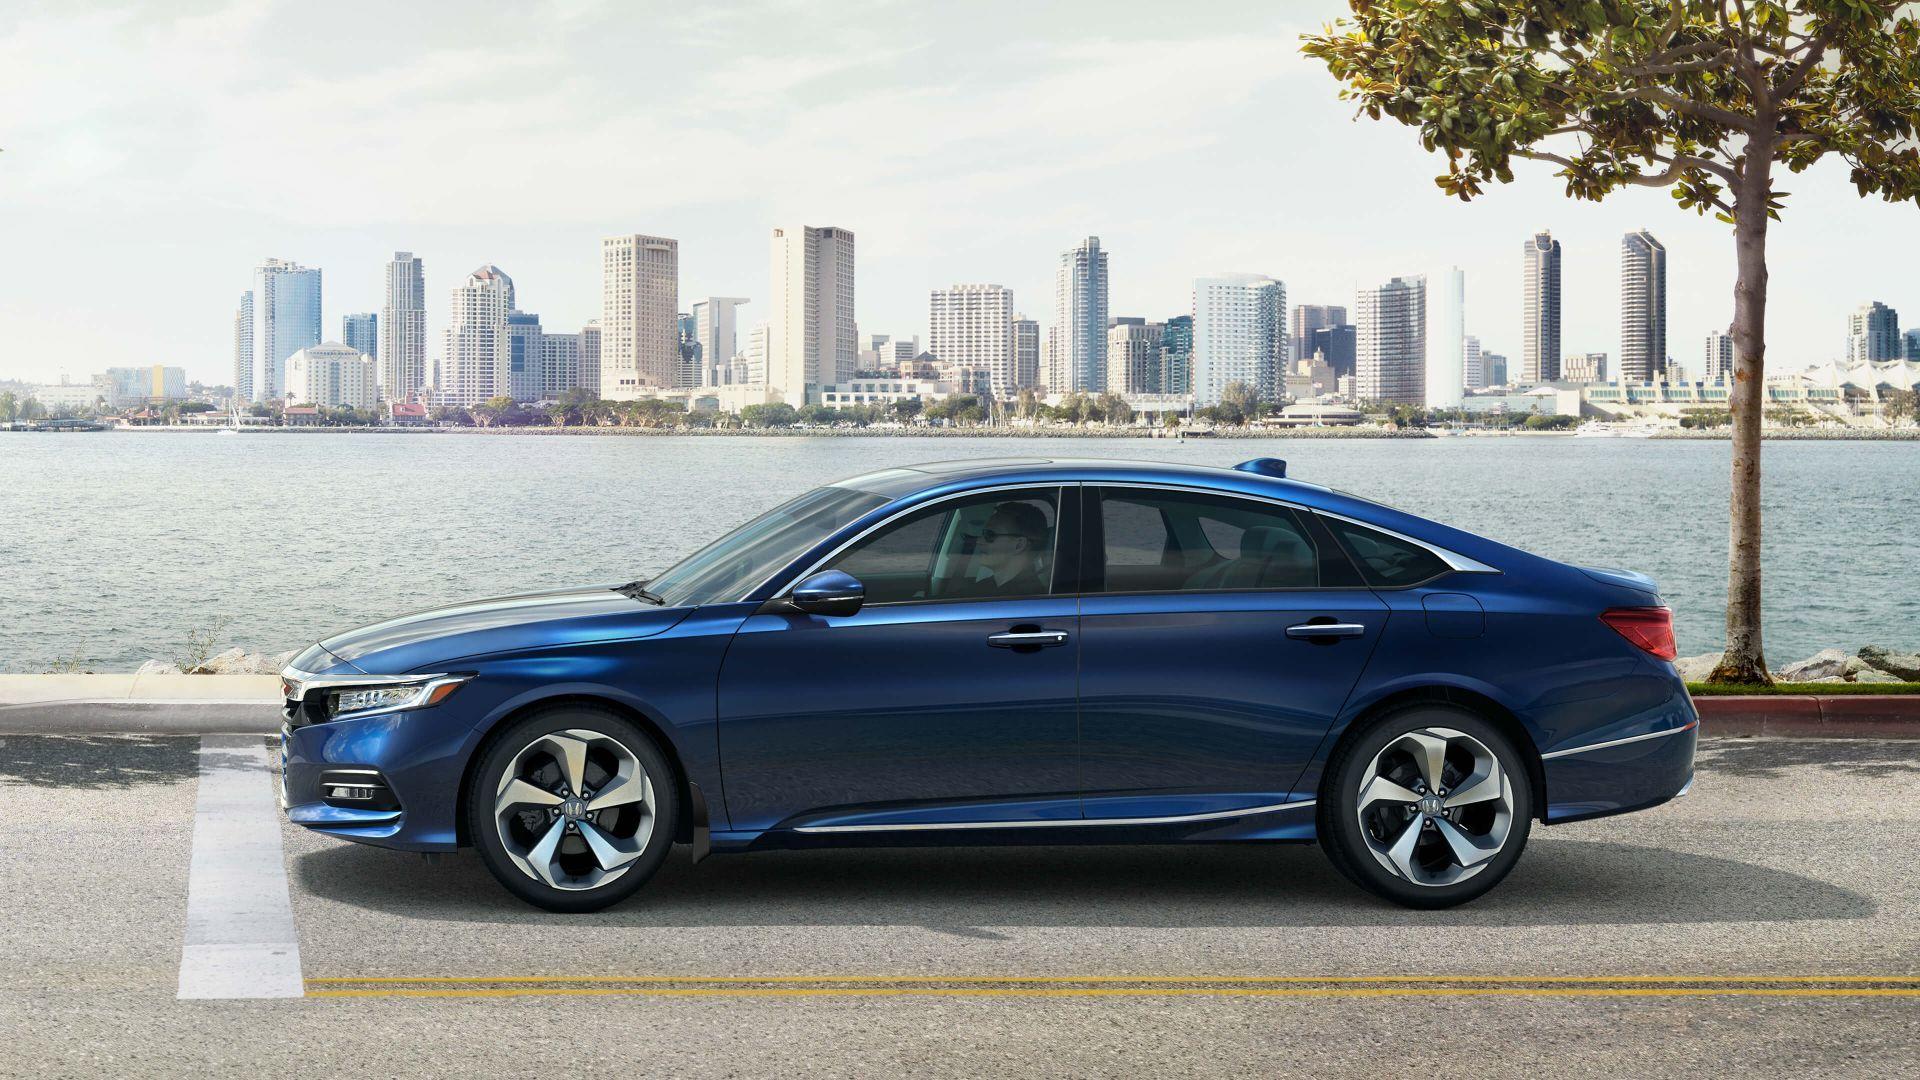 Turbocharged Magic With the 2018 Honda Accord